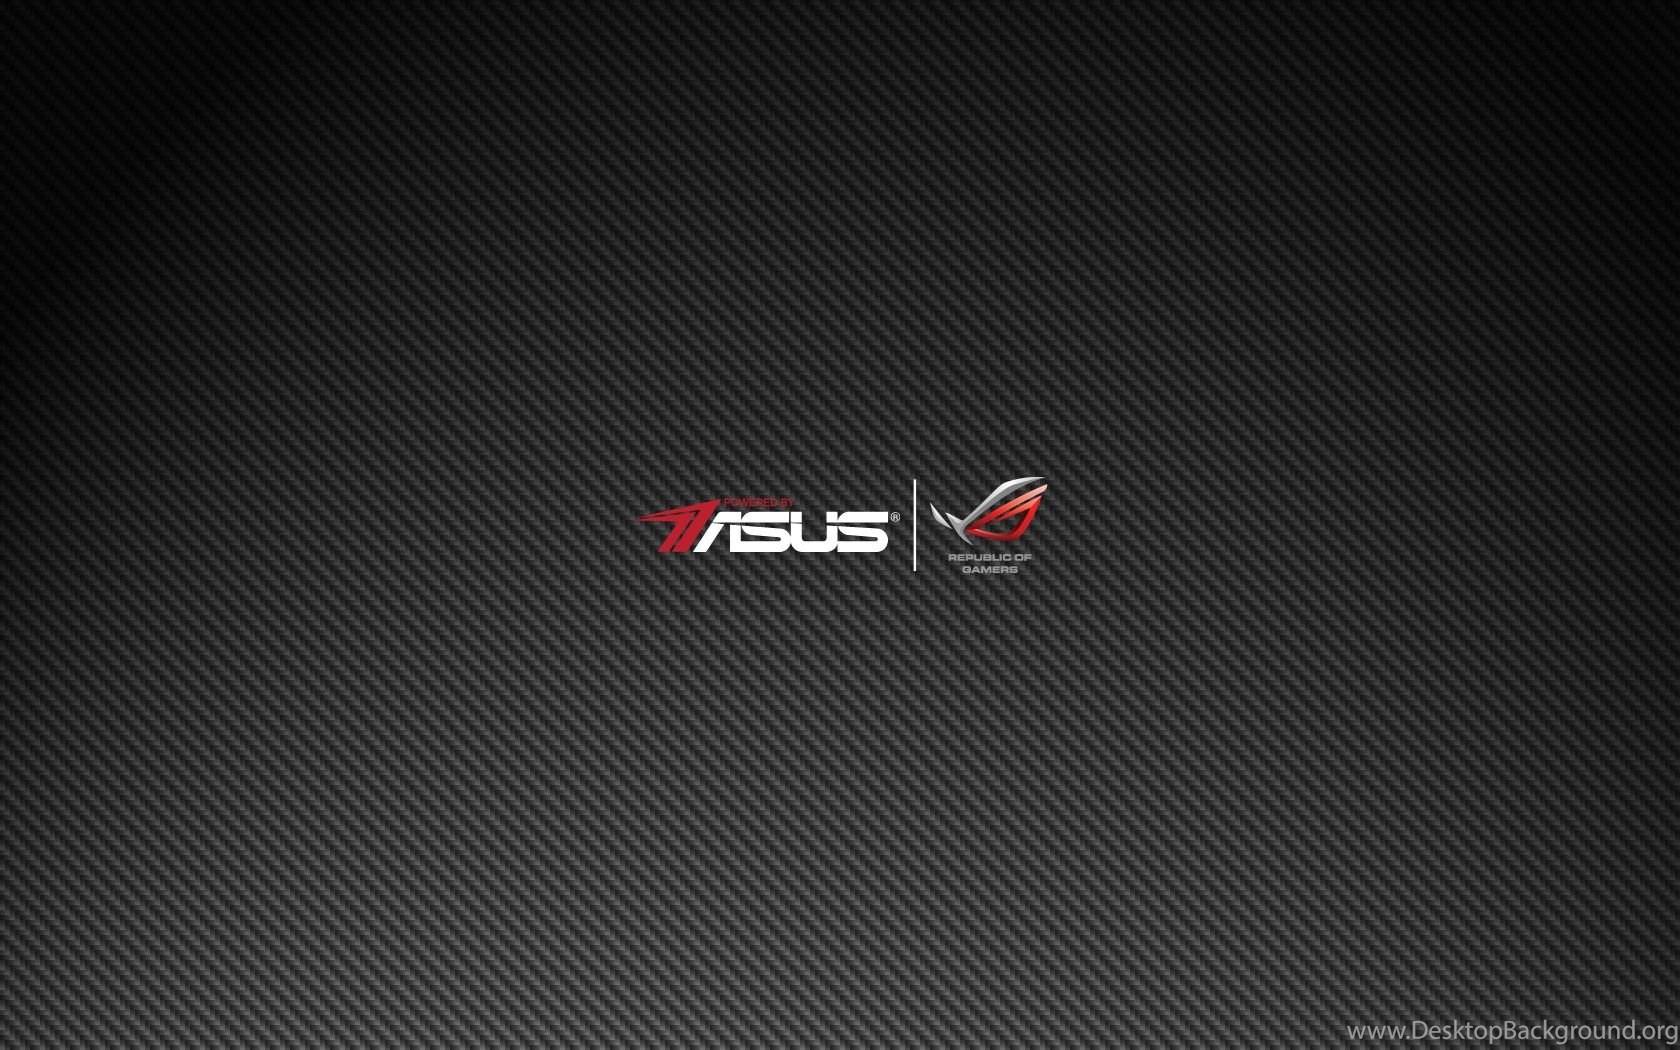 Asus Wallpaper Backgrounds Edition 515 Seo Wallpapers Desktop